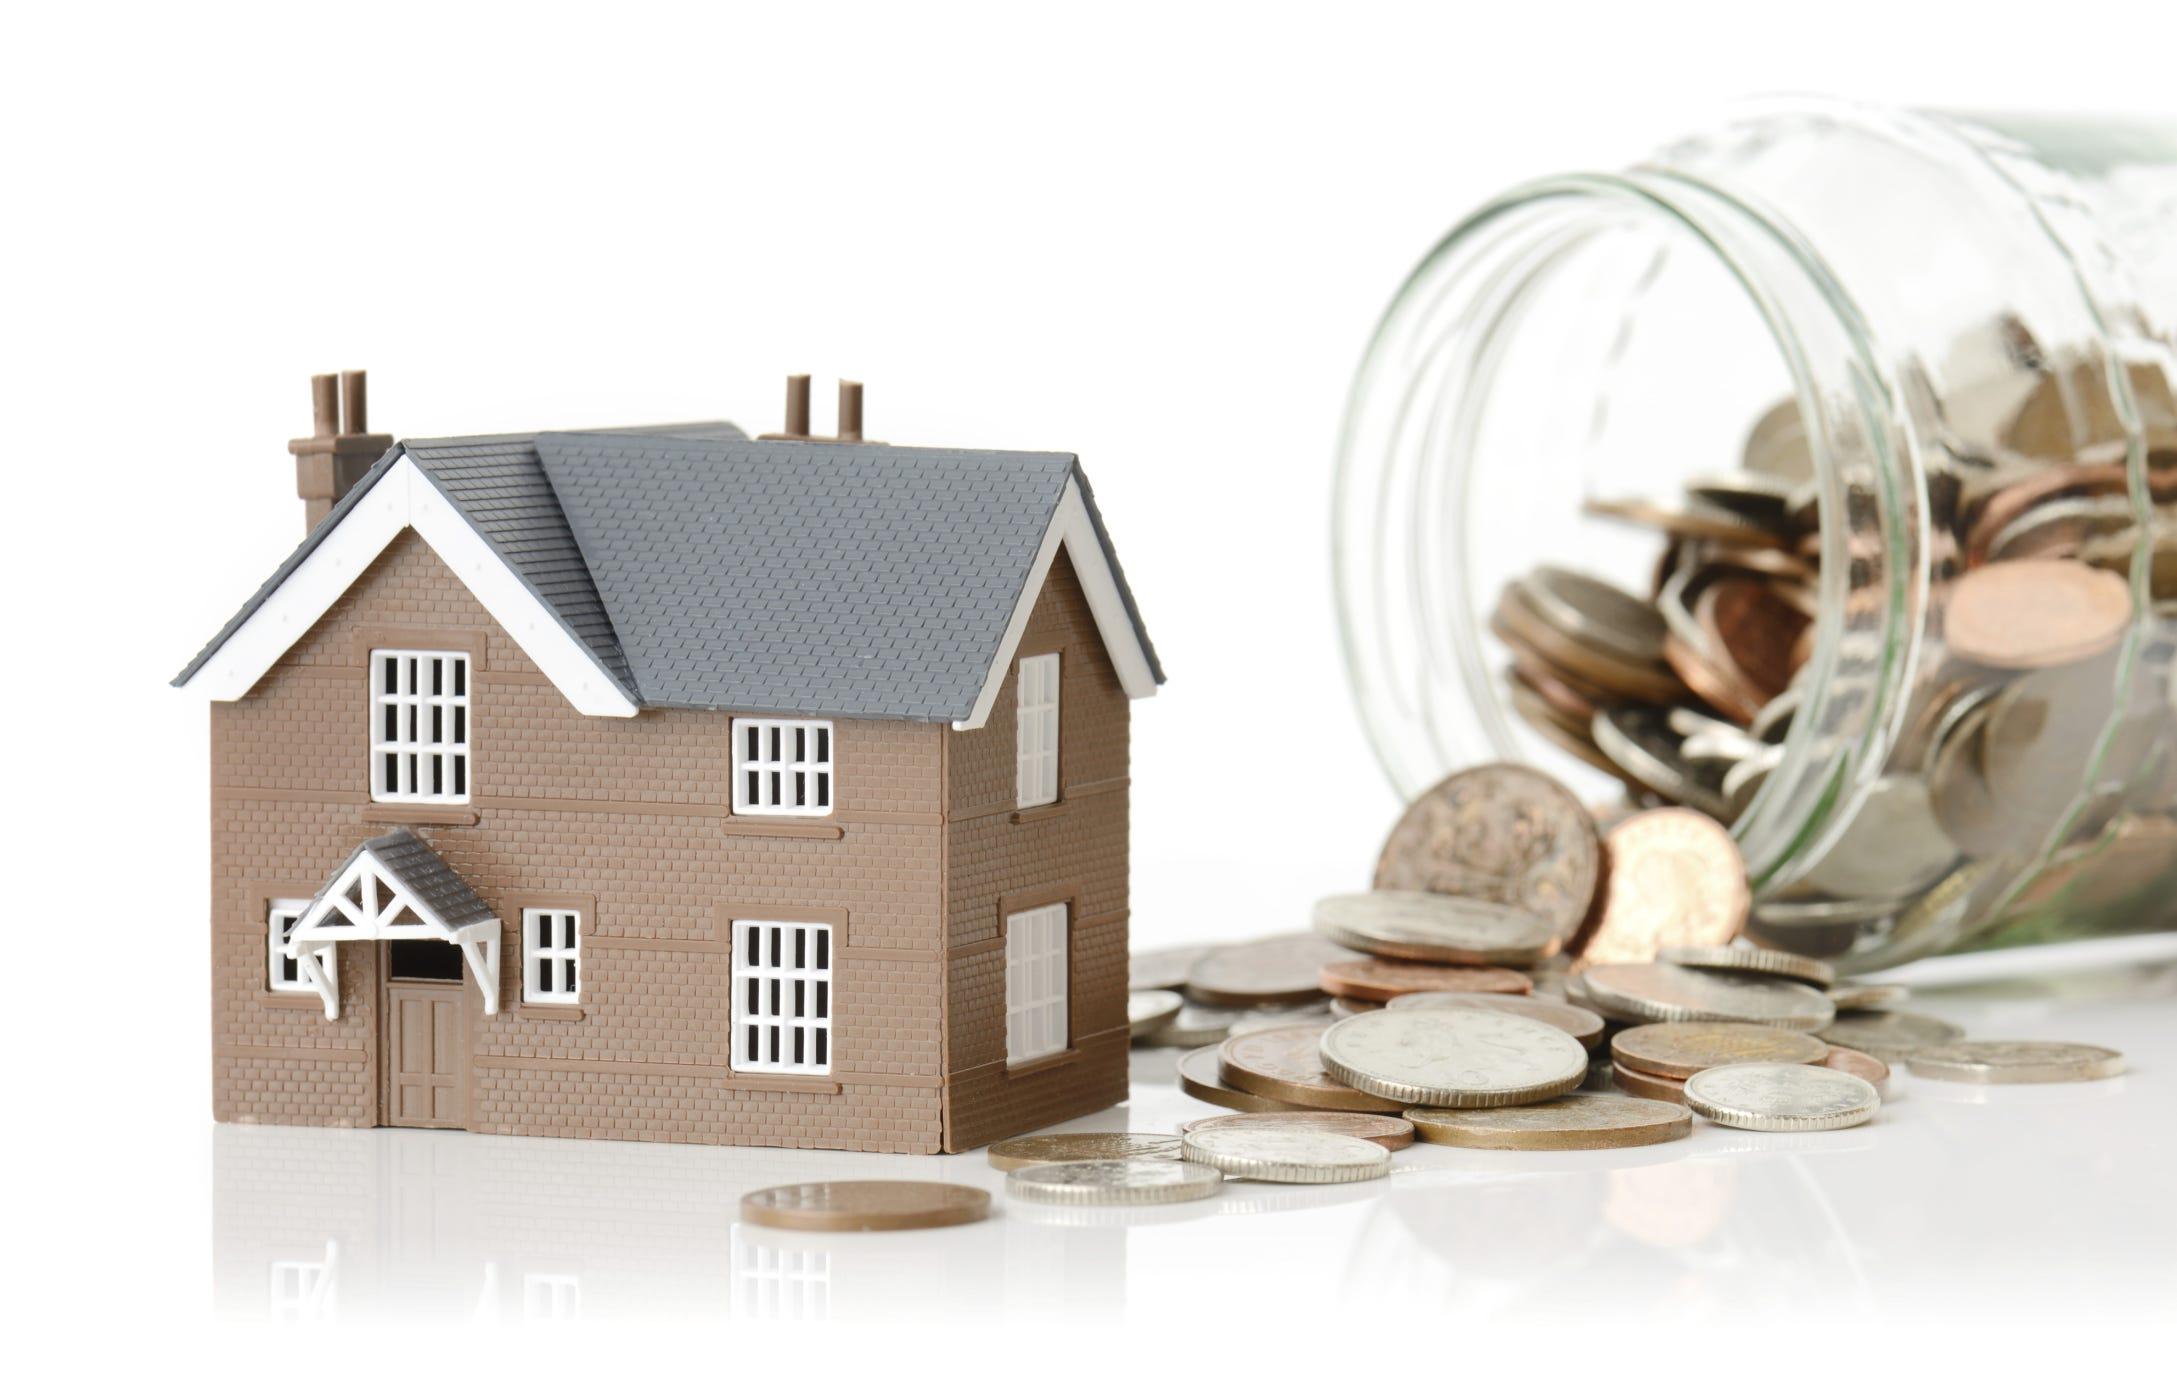 A Foolish Take: U.S. homeownership is at a multi-decade low